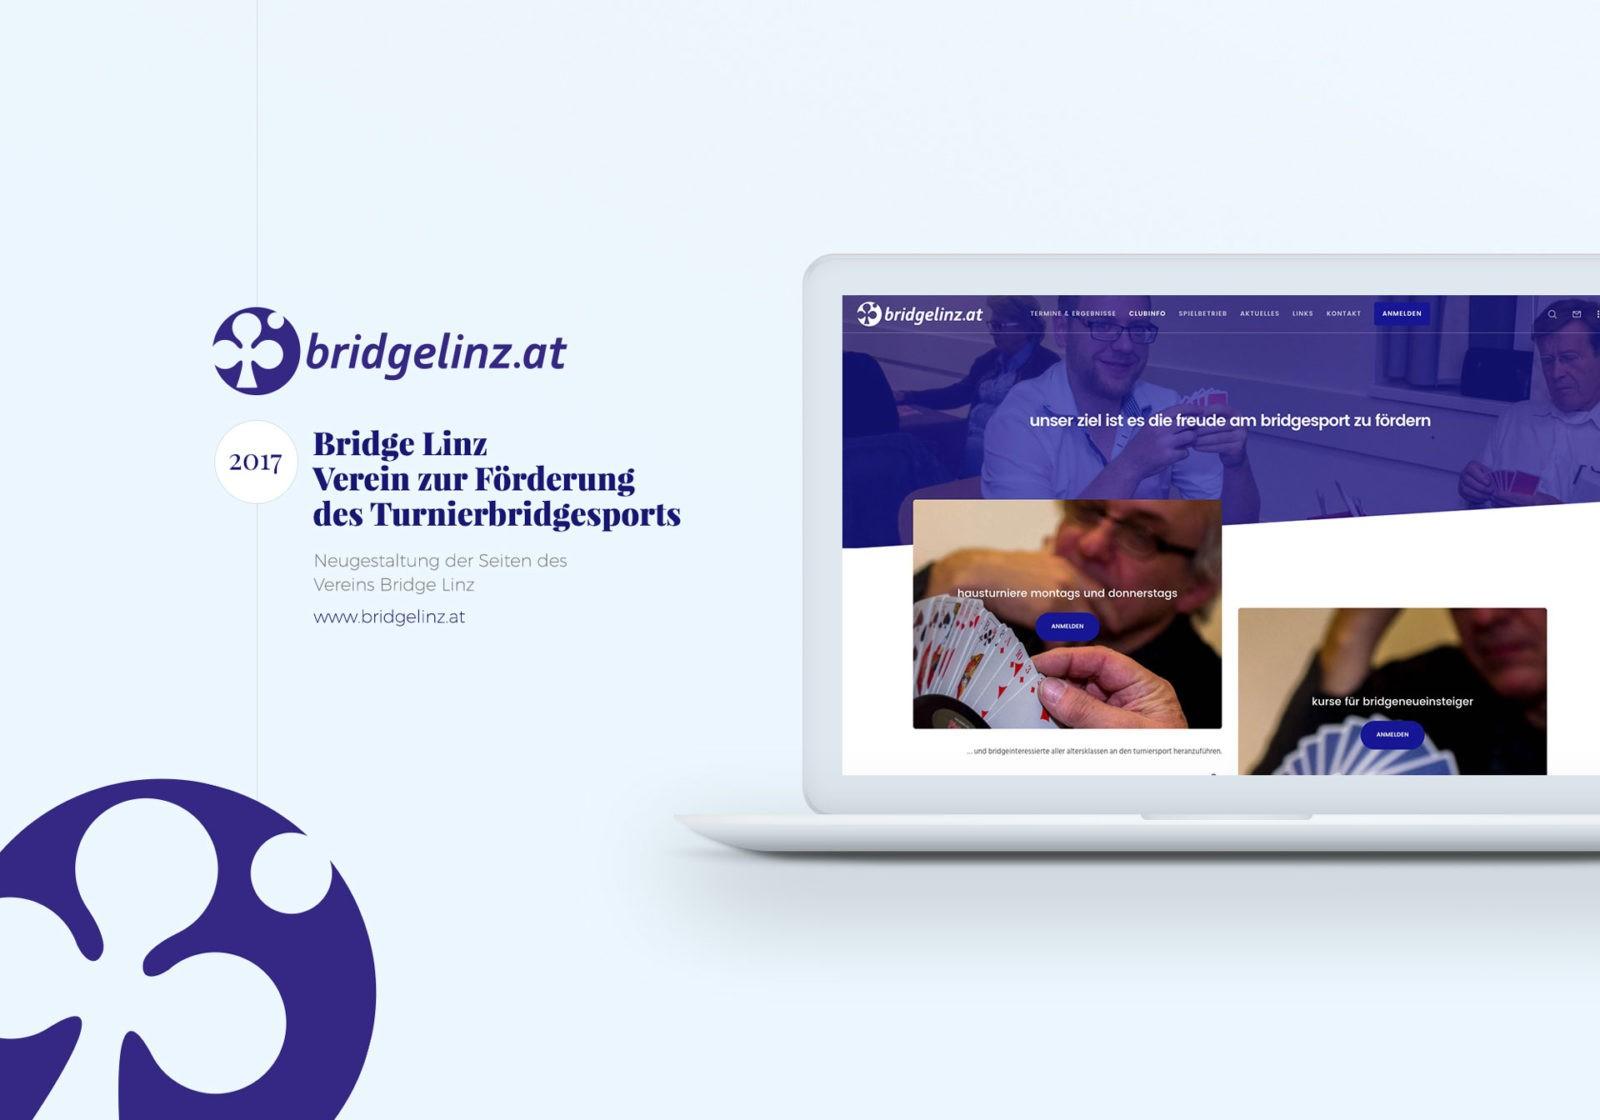 bridgelinz